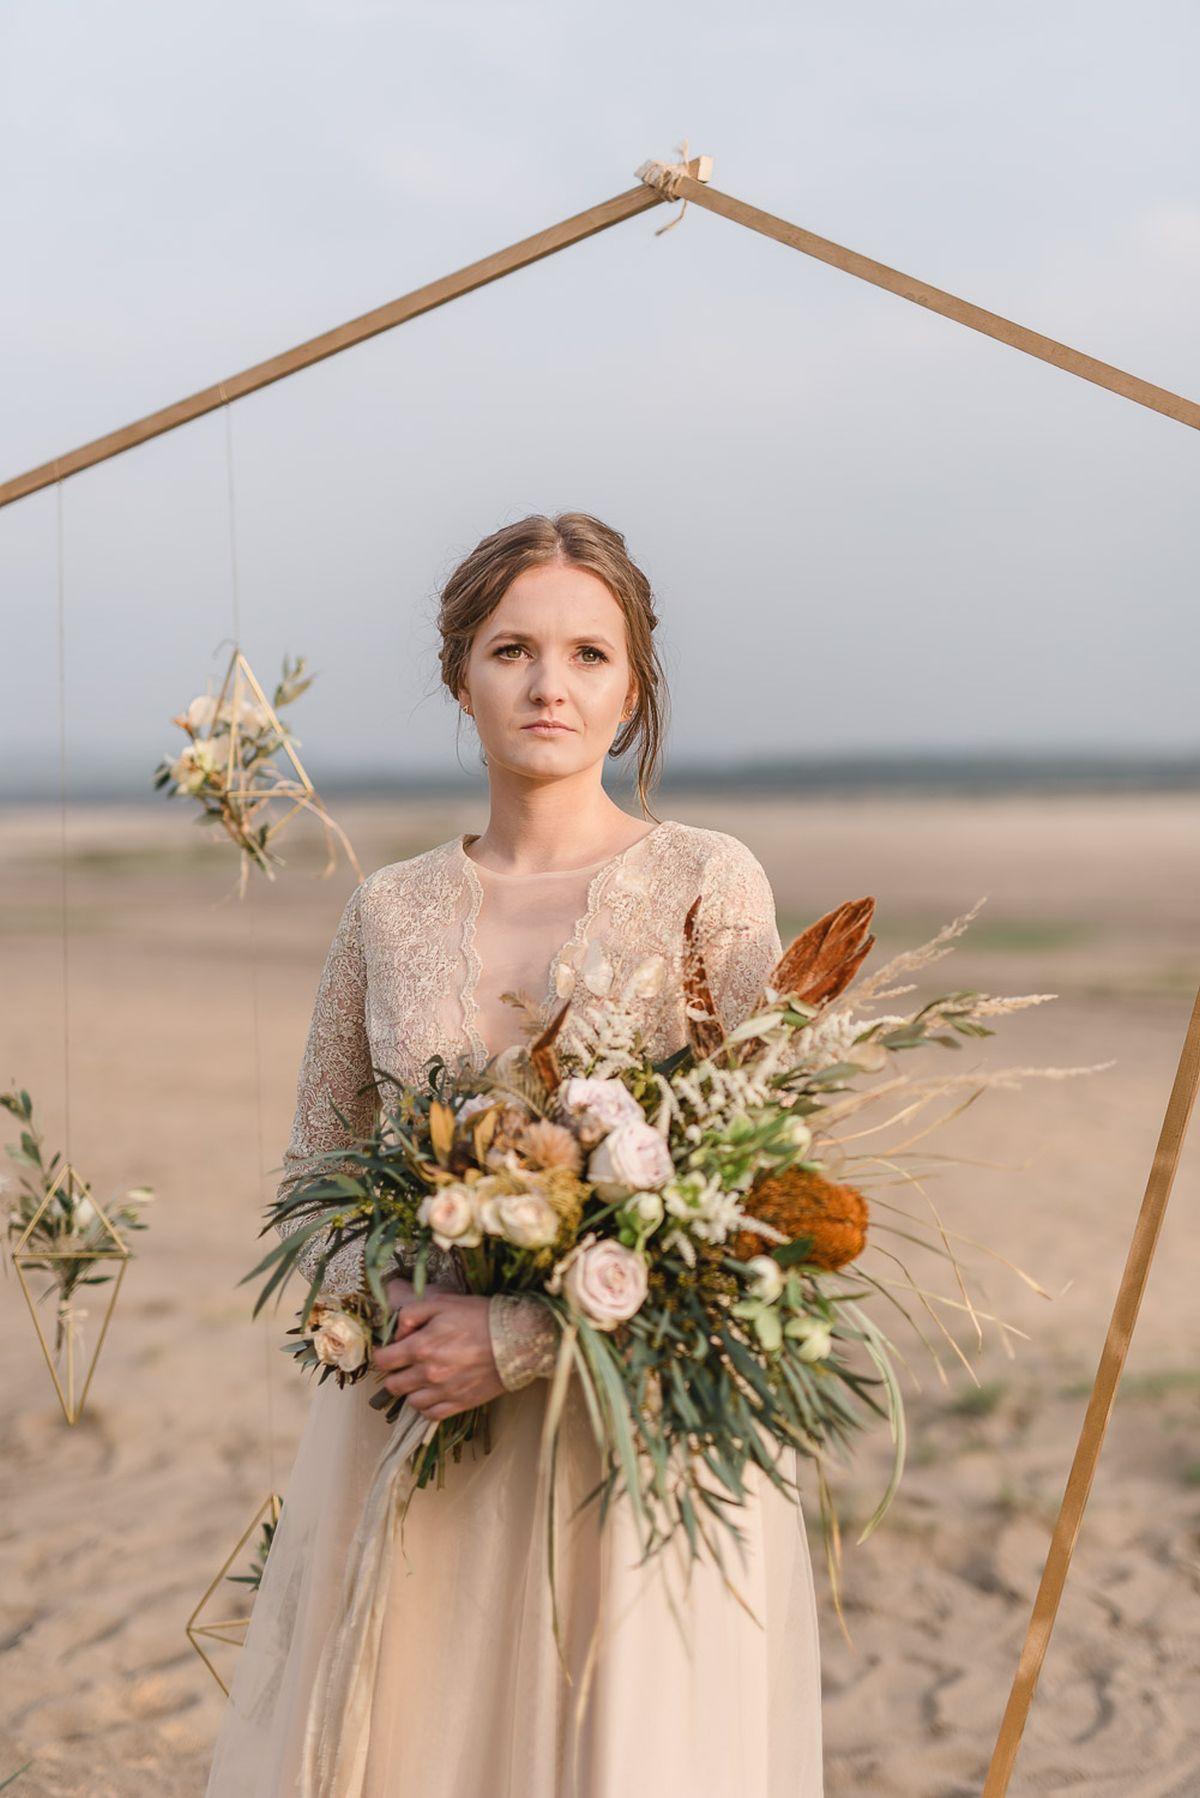 aschaaa-photography-wedding-shoot-wüste (91)